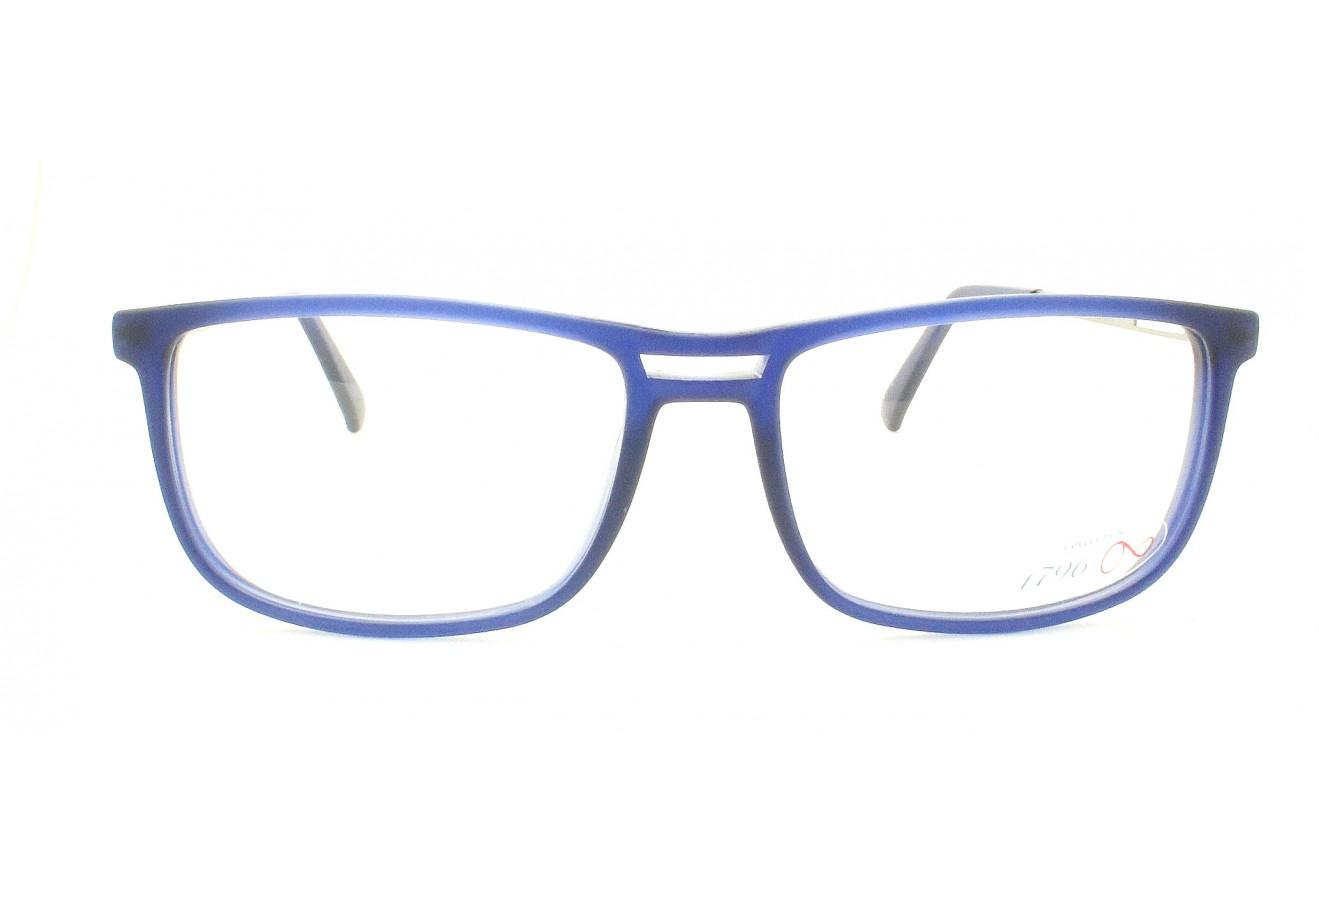 lunettes de vue 1796 cbhc1815 bleu 55 16. Black Bedroom Furniture Sets. Home Design Ideas